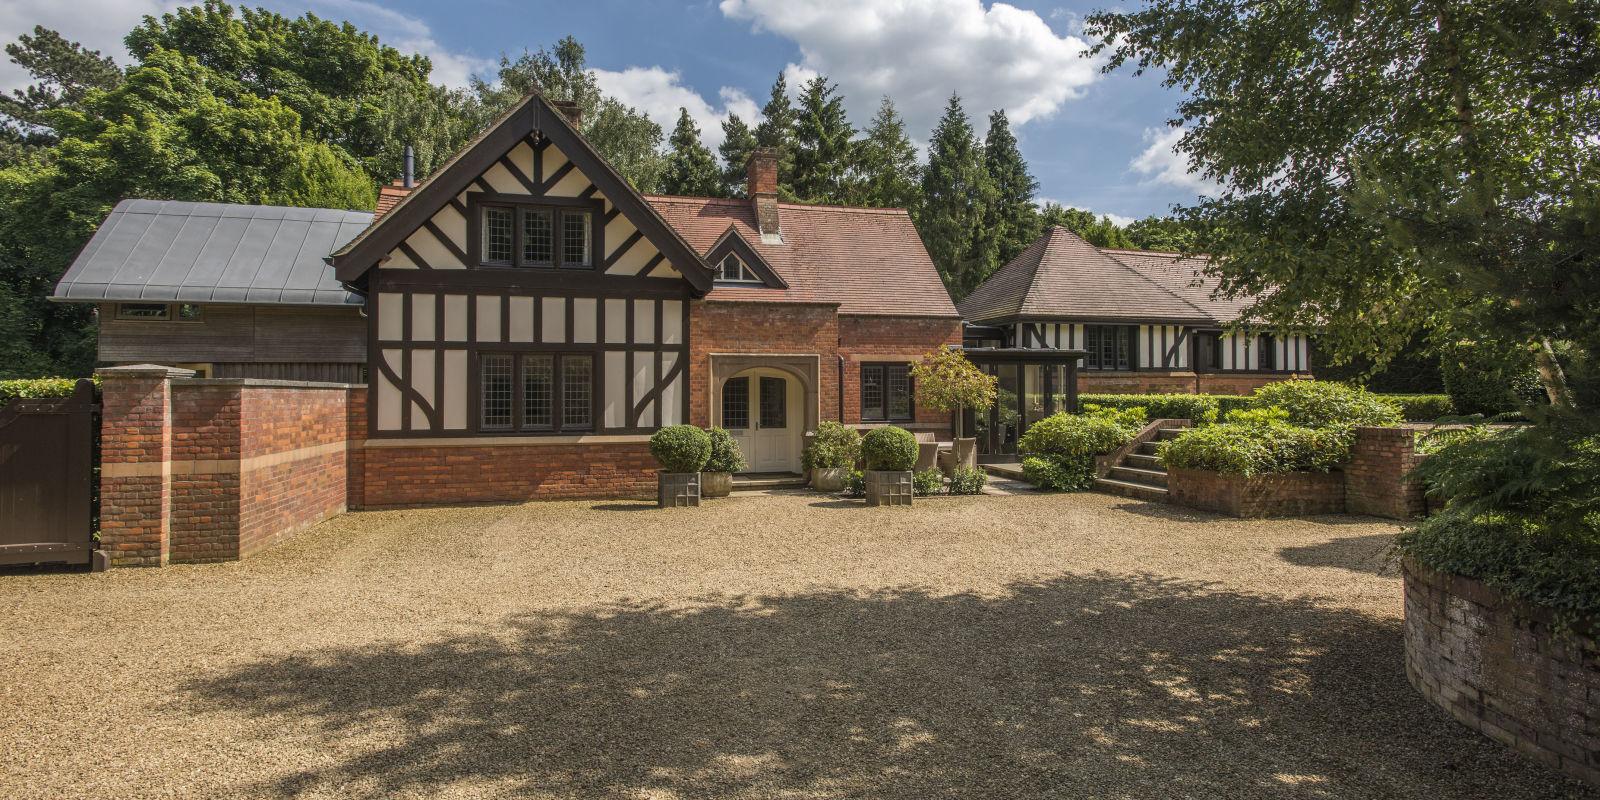 cost to renovate a kitchen garbage cans walmart norfolk home near queen elizabeth's sandringham estate was ...